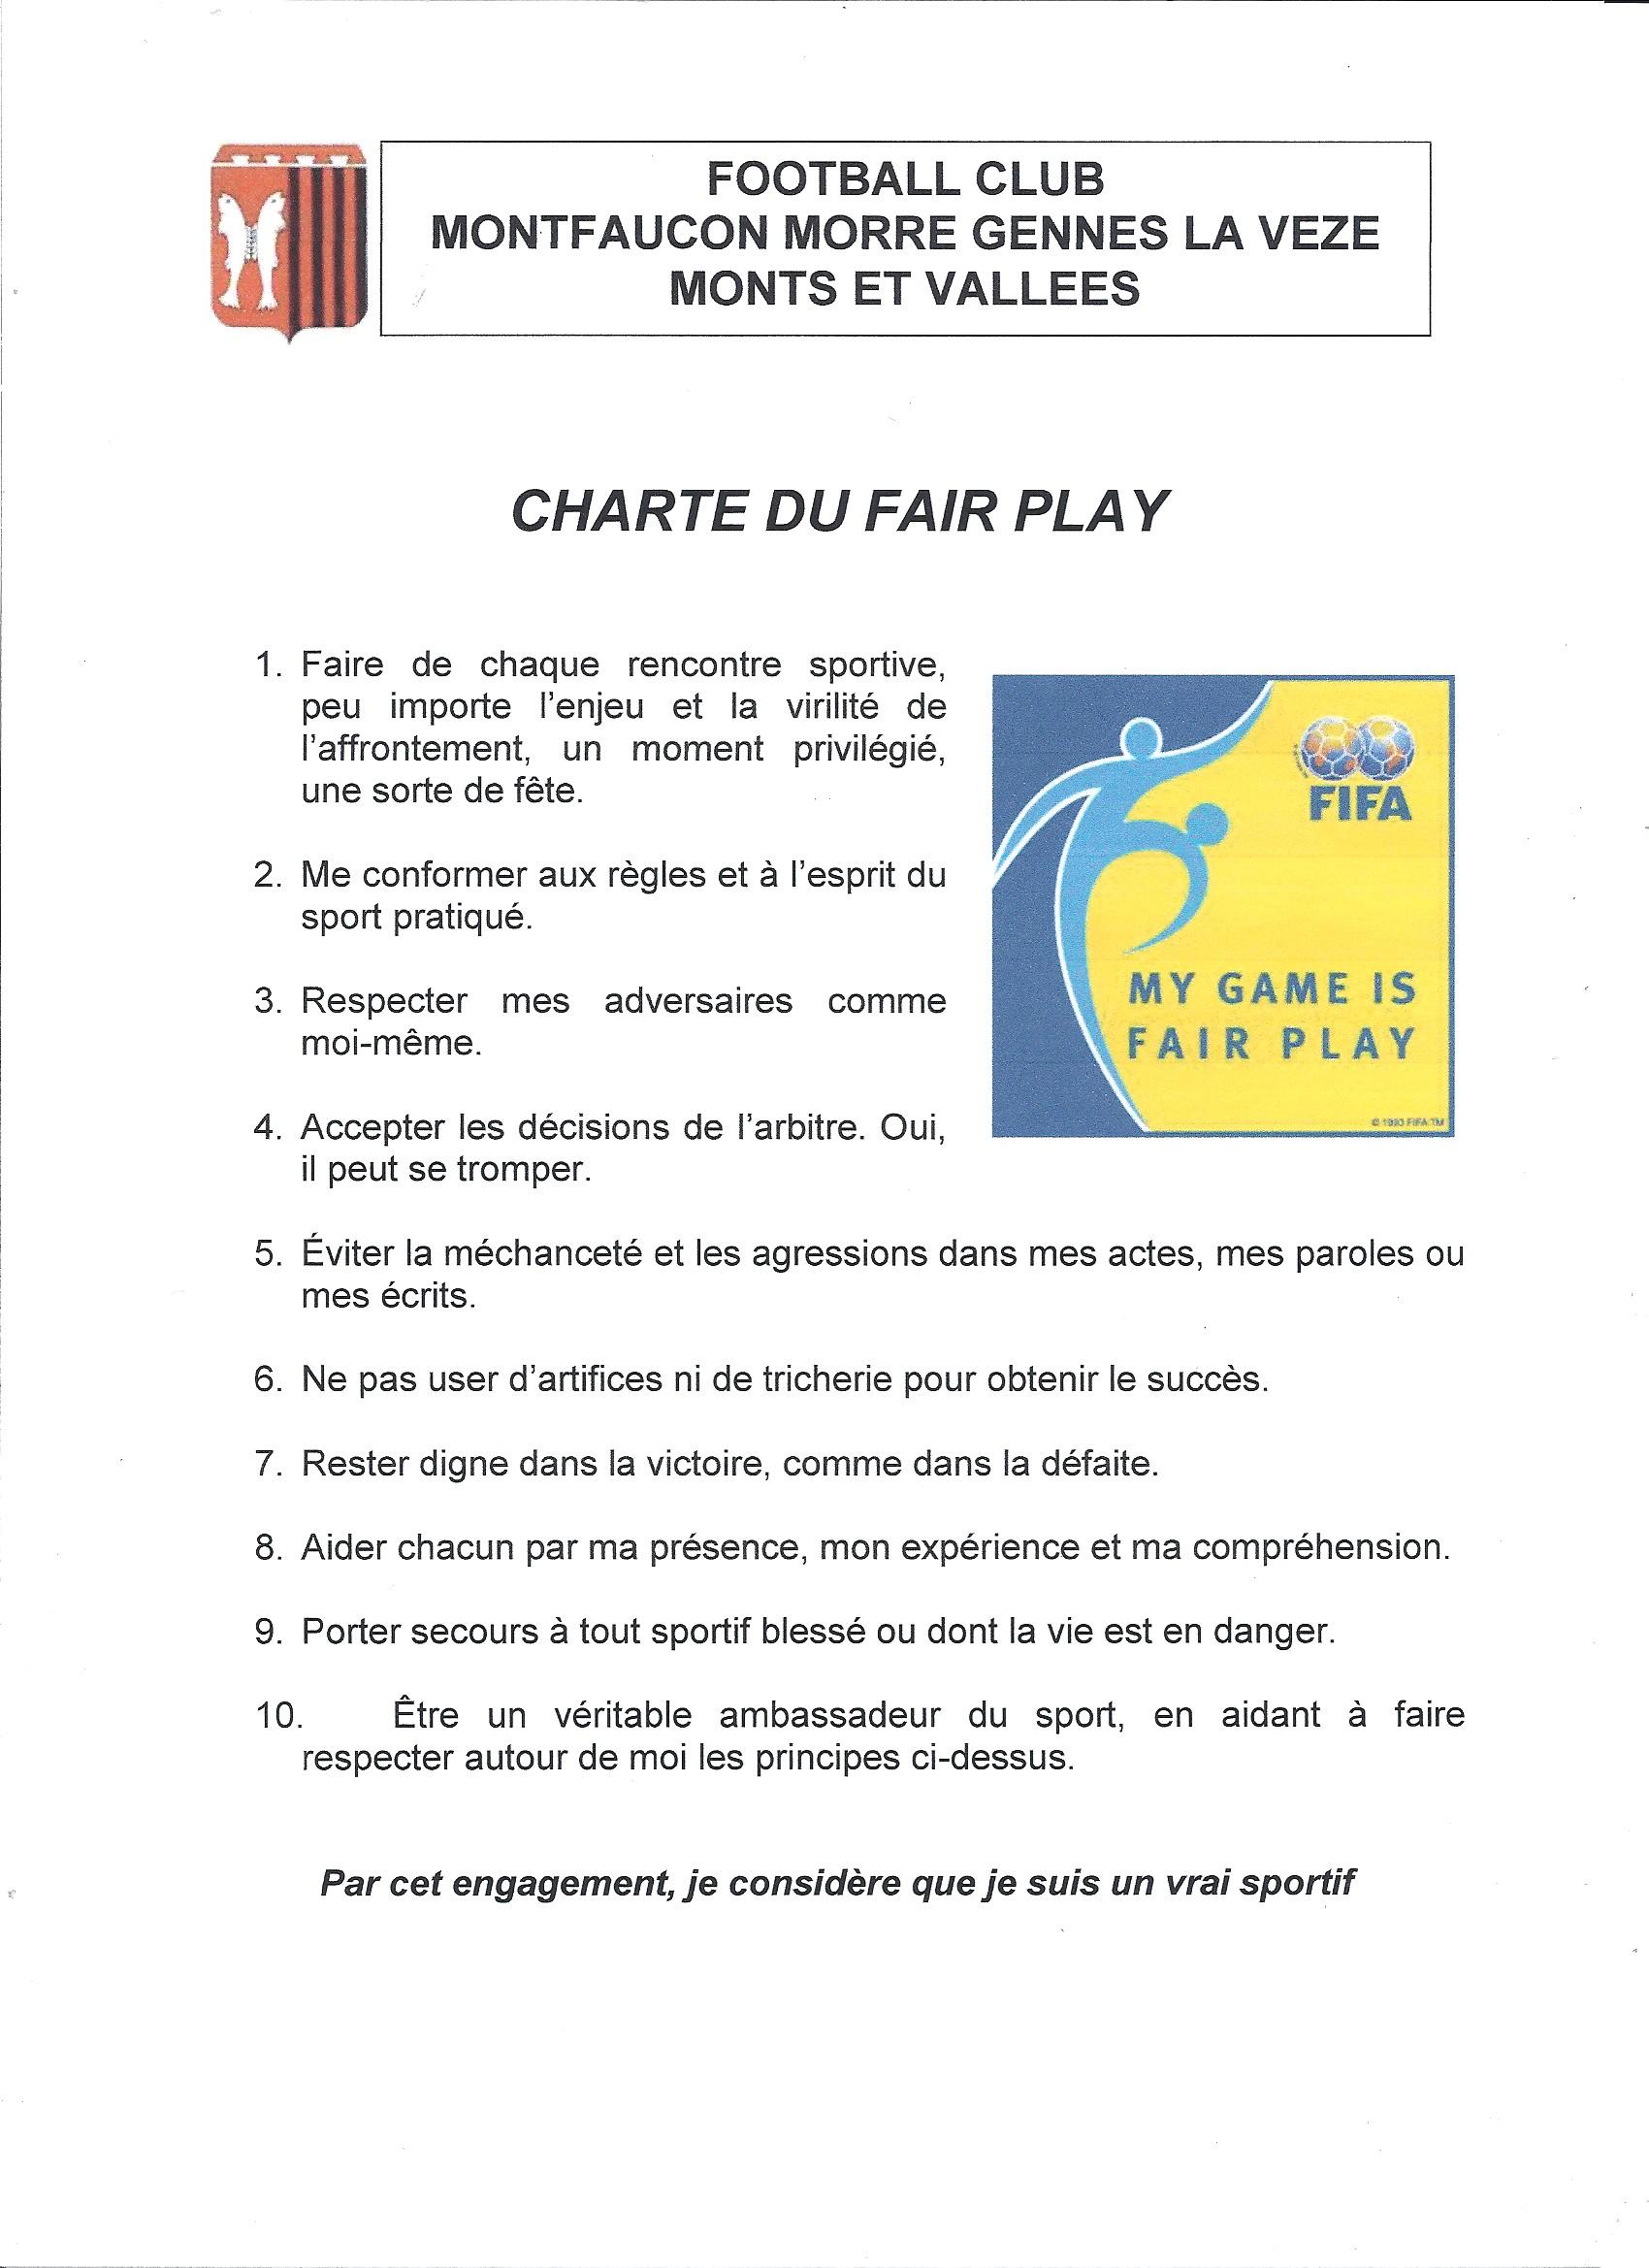 Charte fairplay